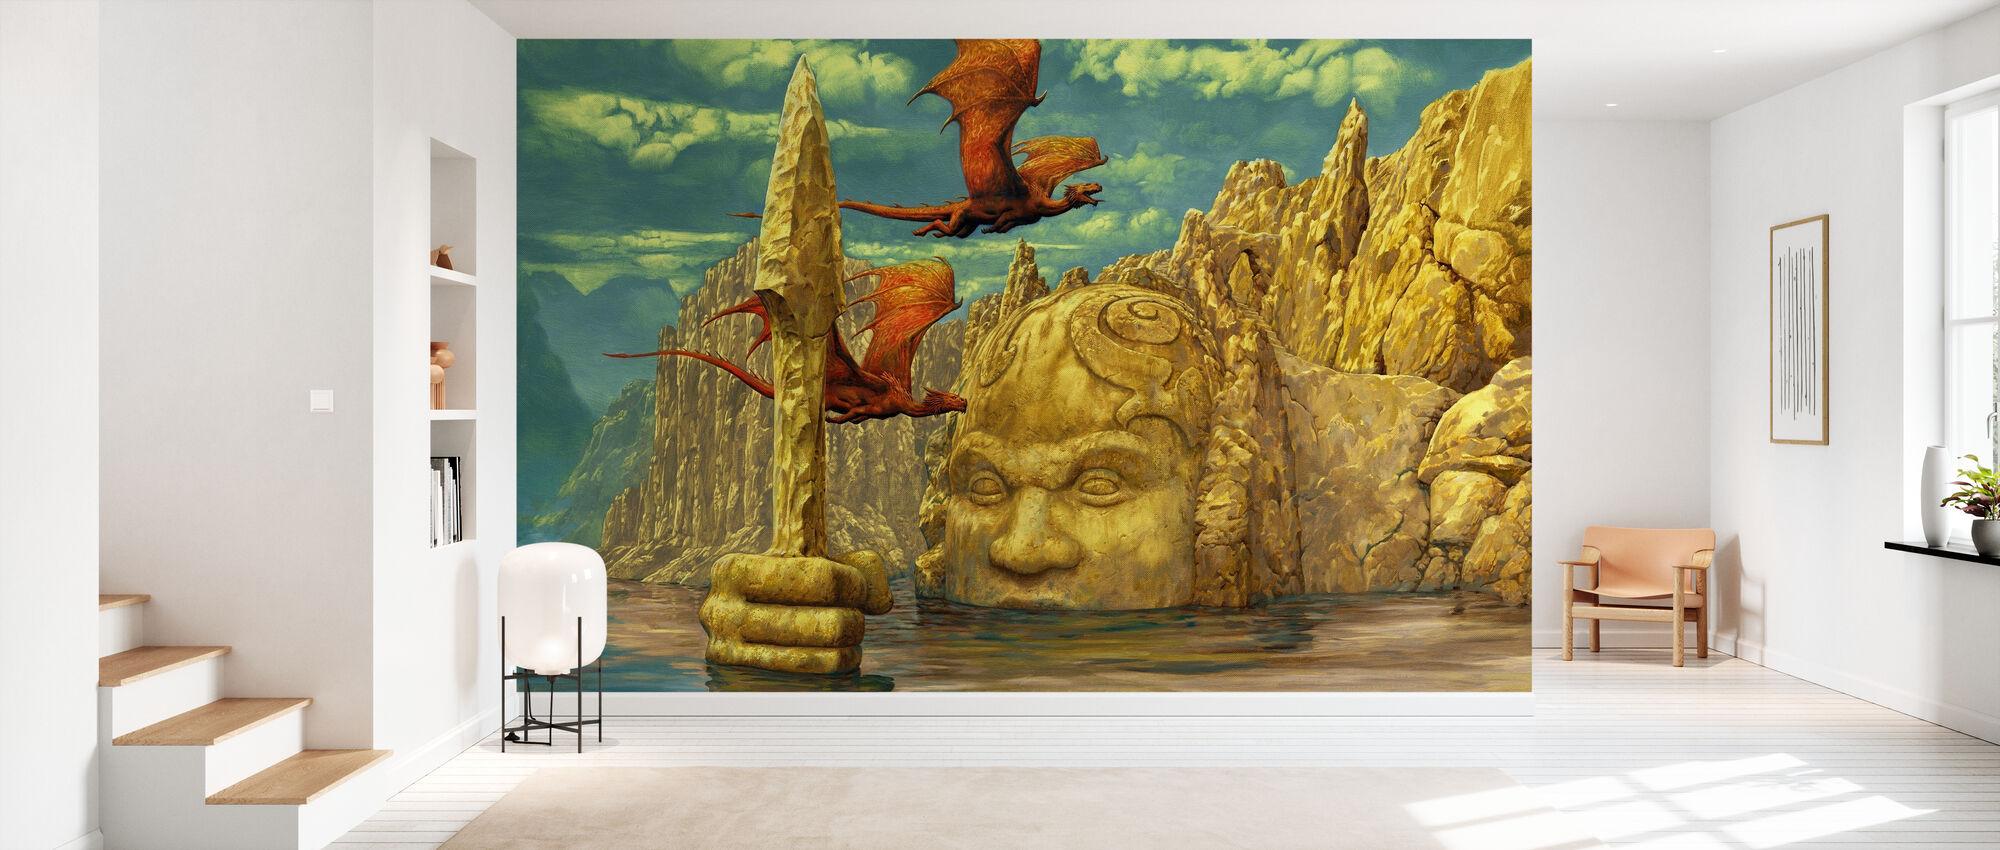 Lake Temple - Wallpaper - Hallway